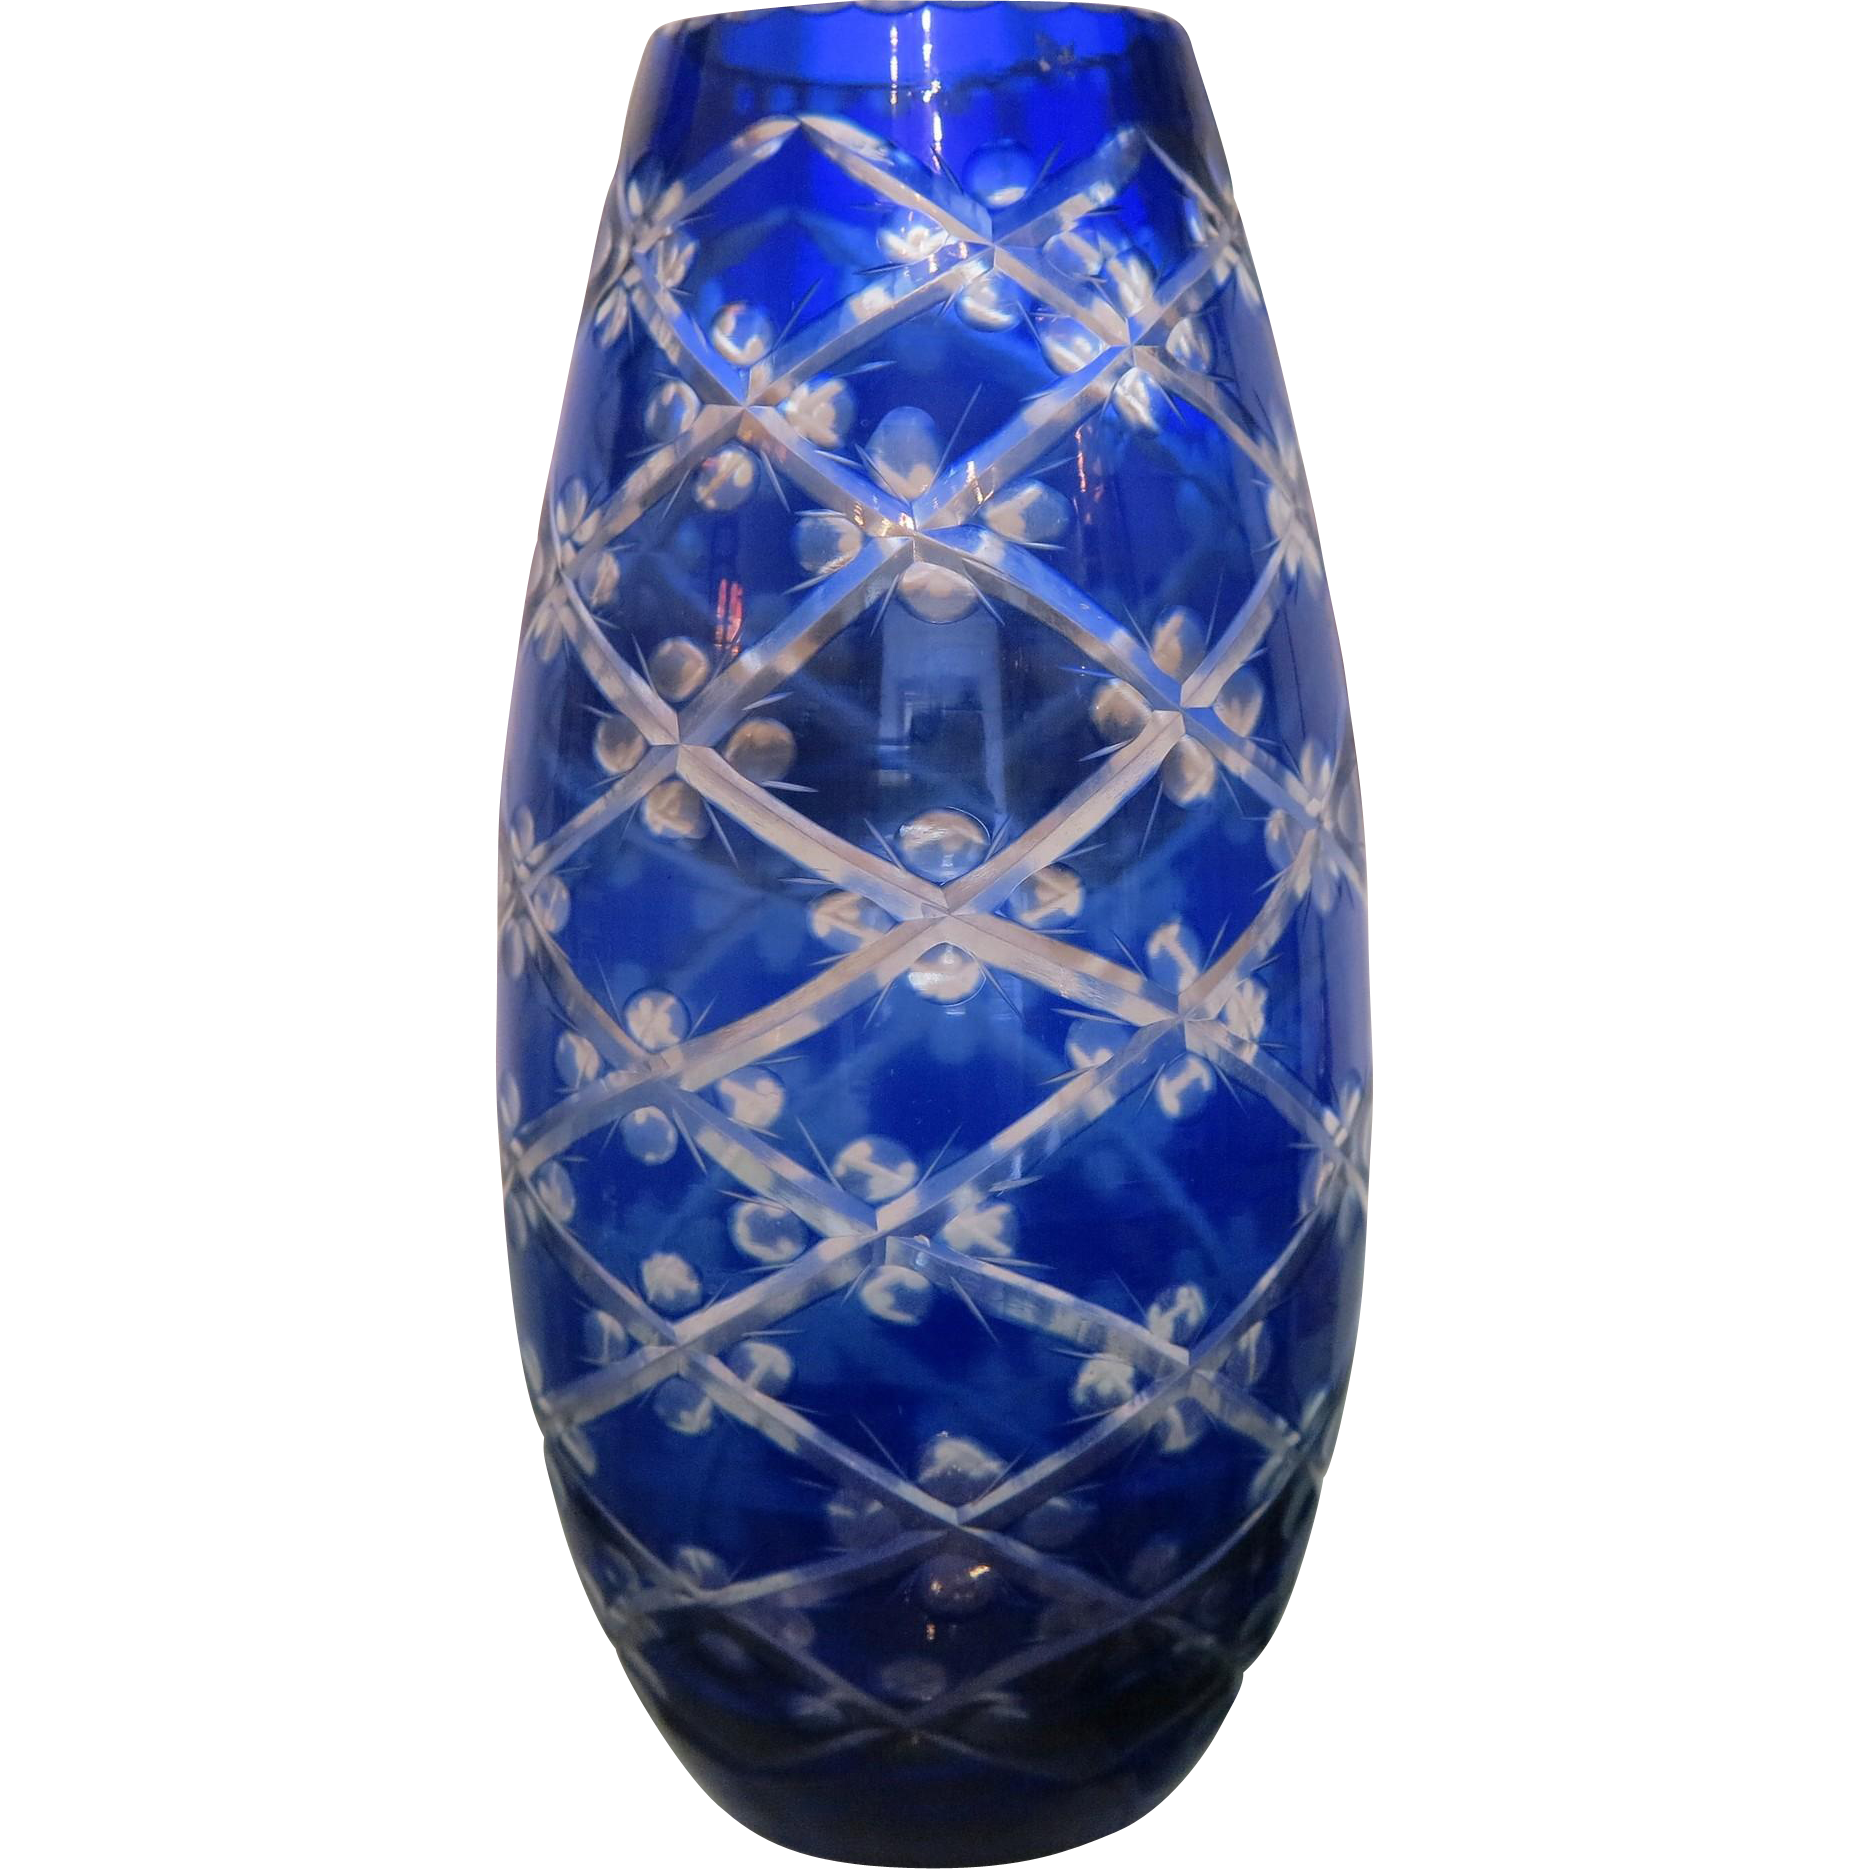 Art deco bohemian cobalt blue crystal glass vase ca1930 art deco bohemian cobalt blue crystal glass vase ca1930 chateau antique ruby lane floridaeventfo Image collections